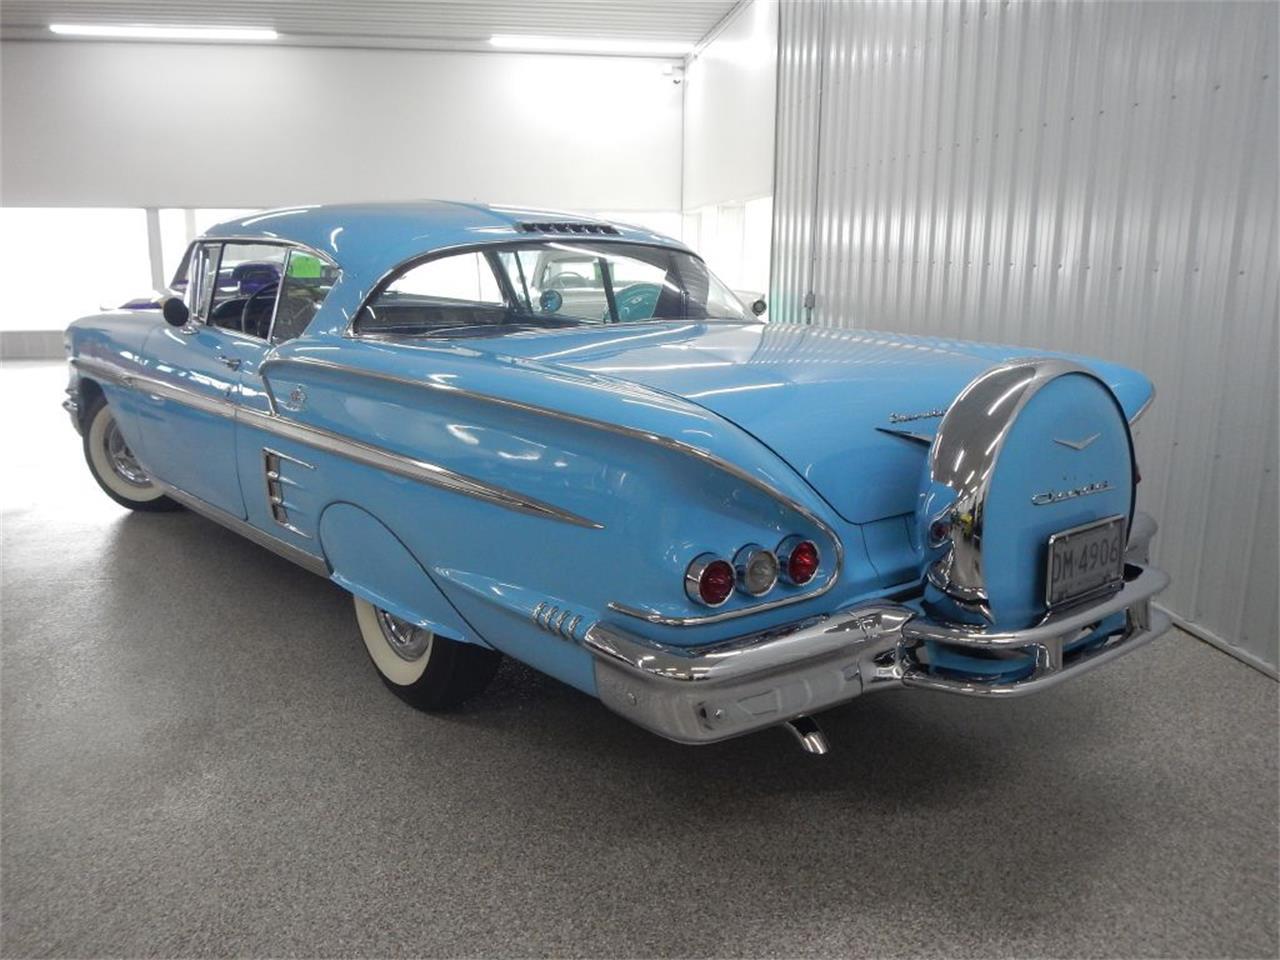 1958 Chevrolet Impala (CC-1266488) for sale in Celina, Ohio